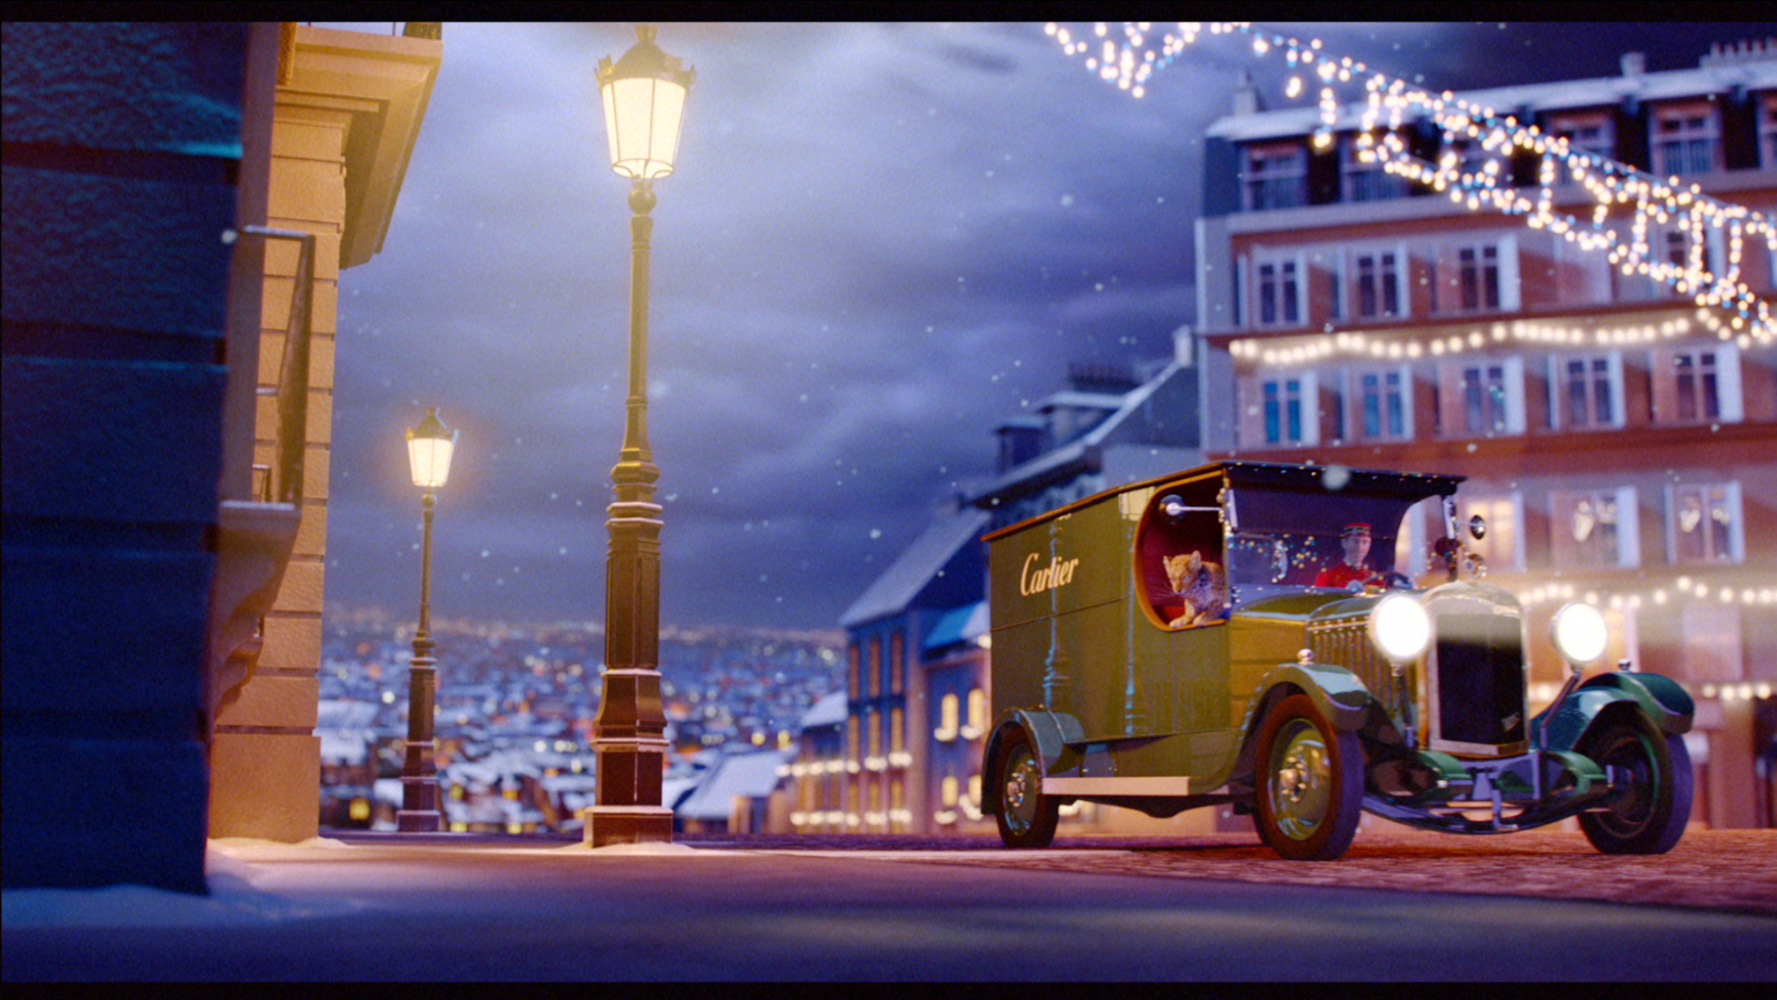 Cartier film d'animation